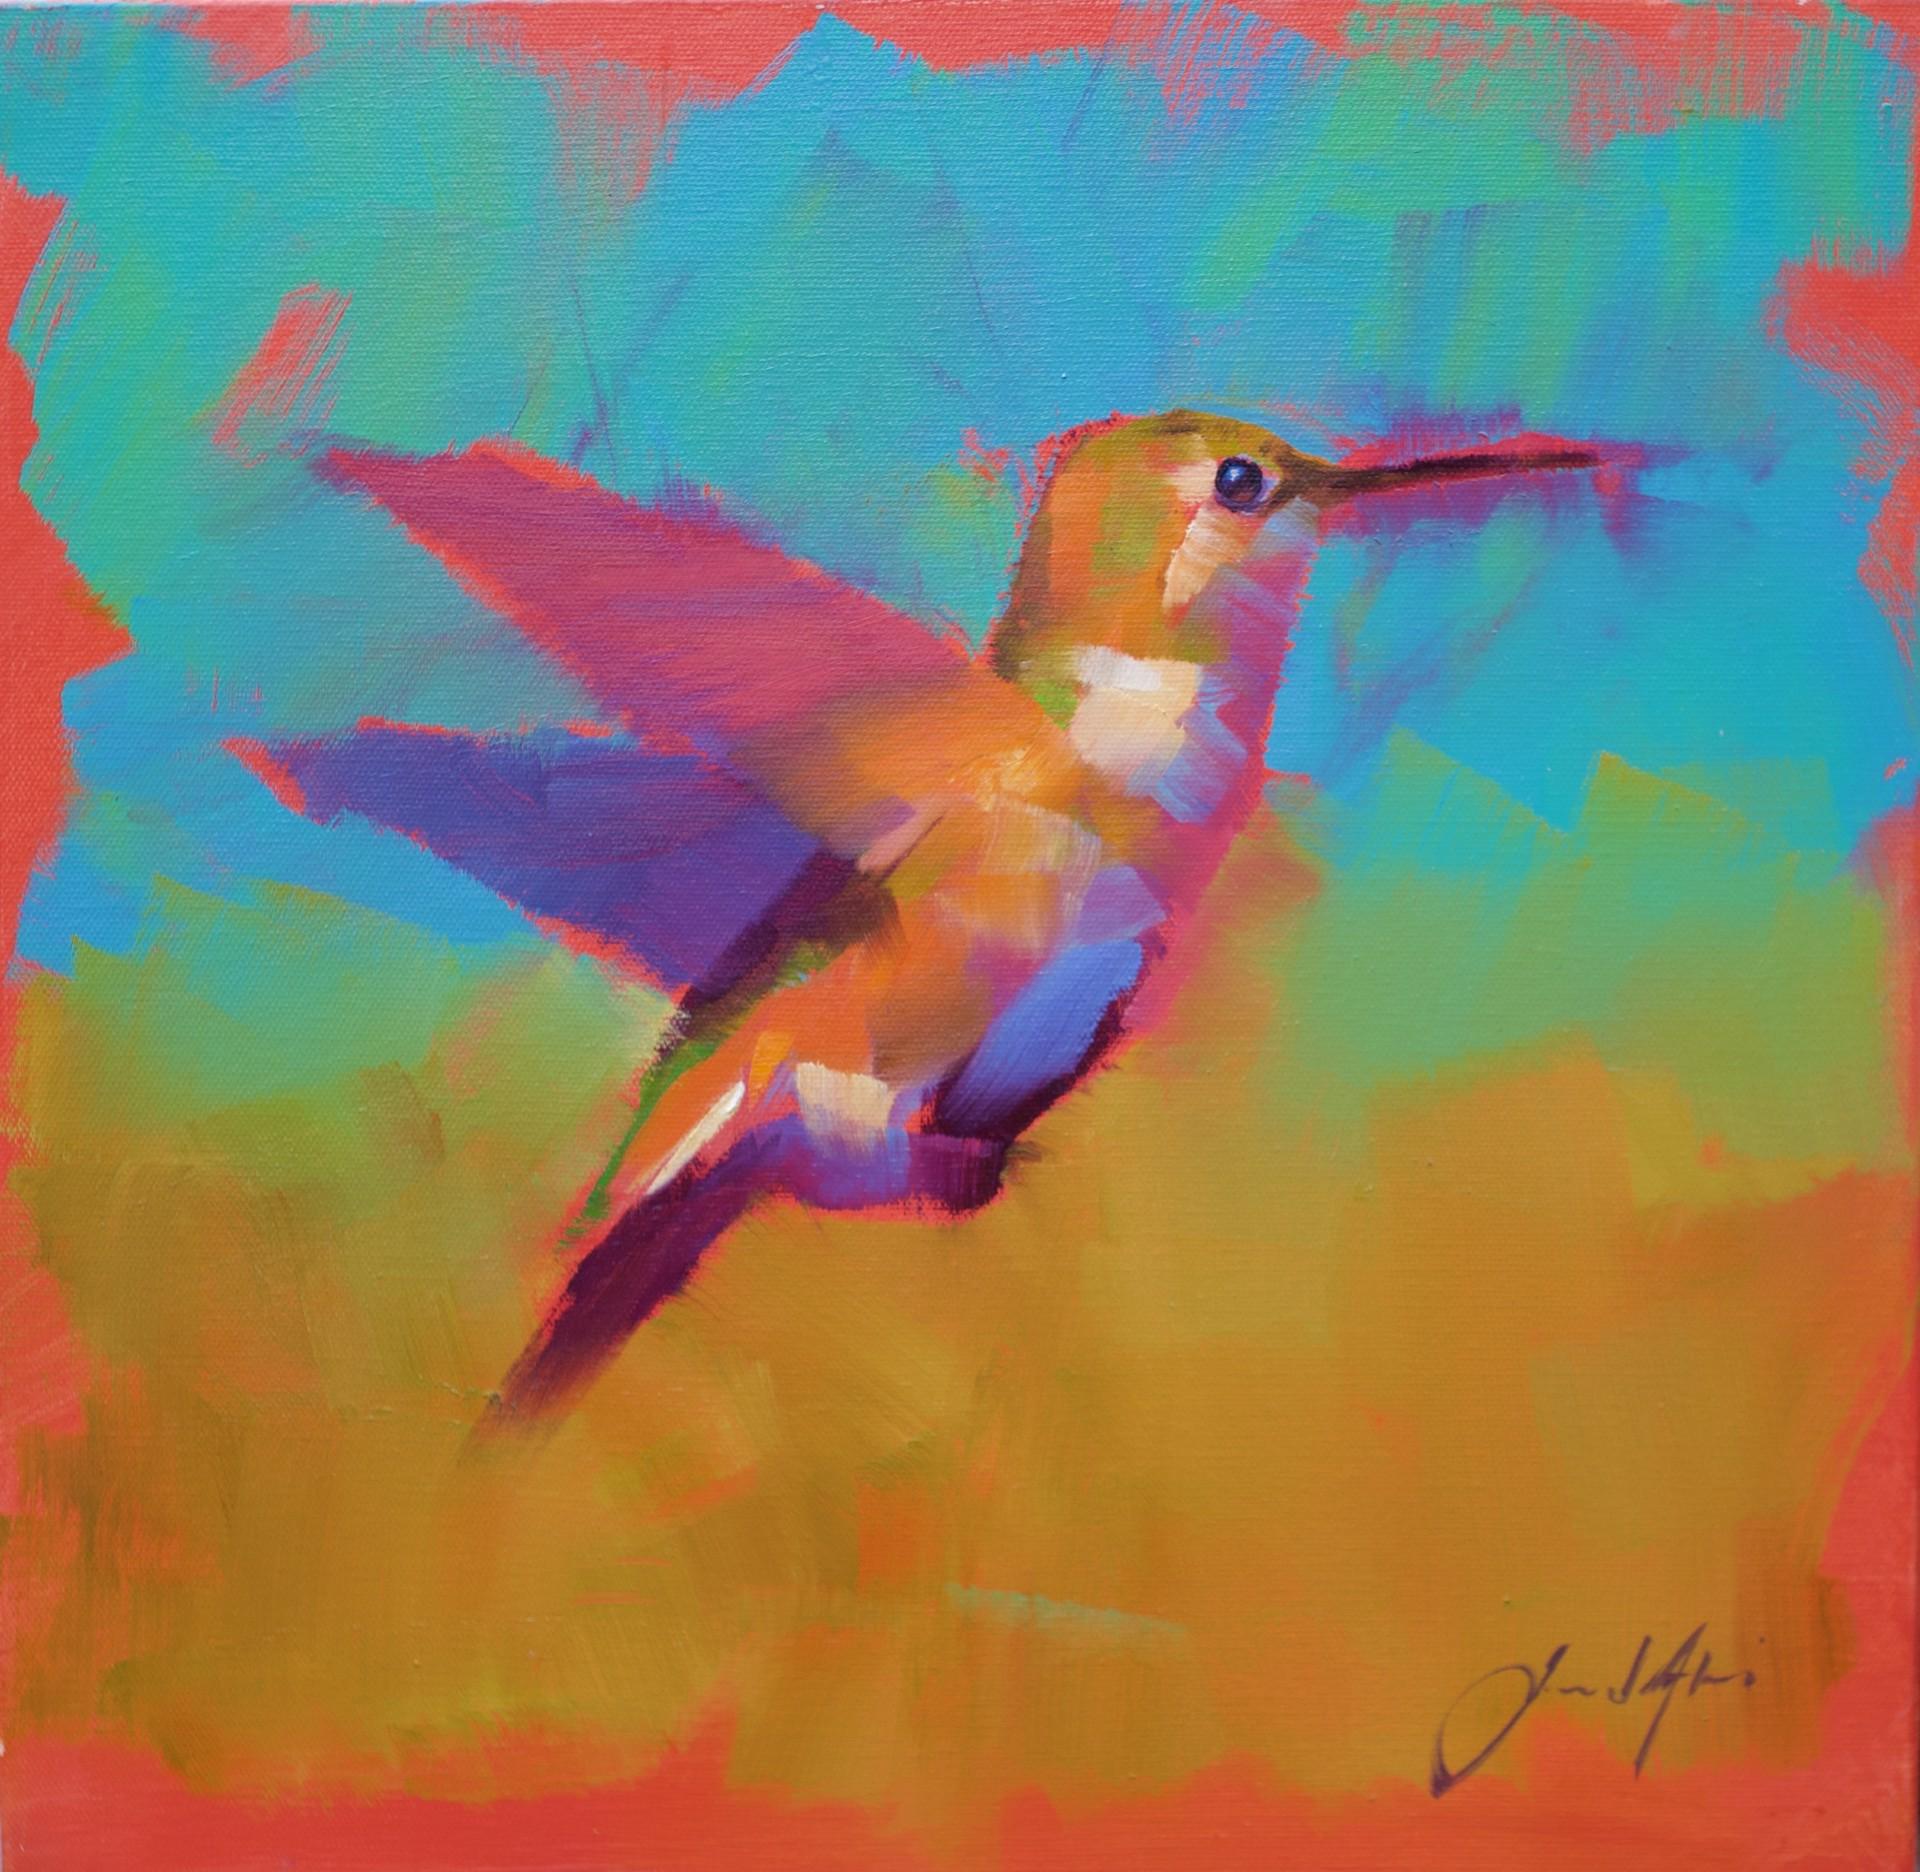 Hummingbird XI by Jamel Akib